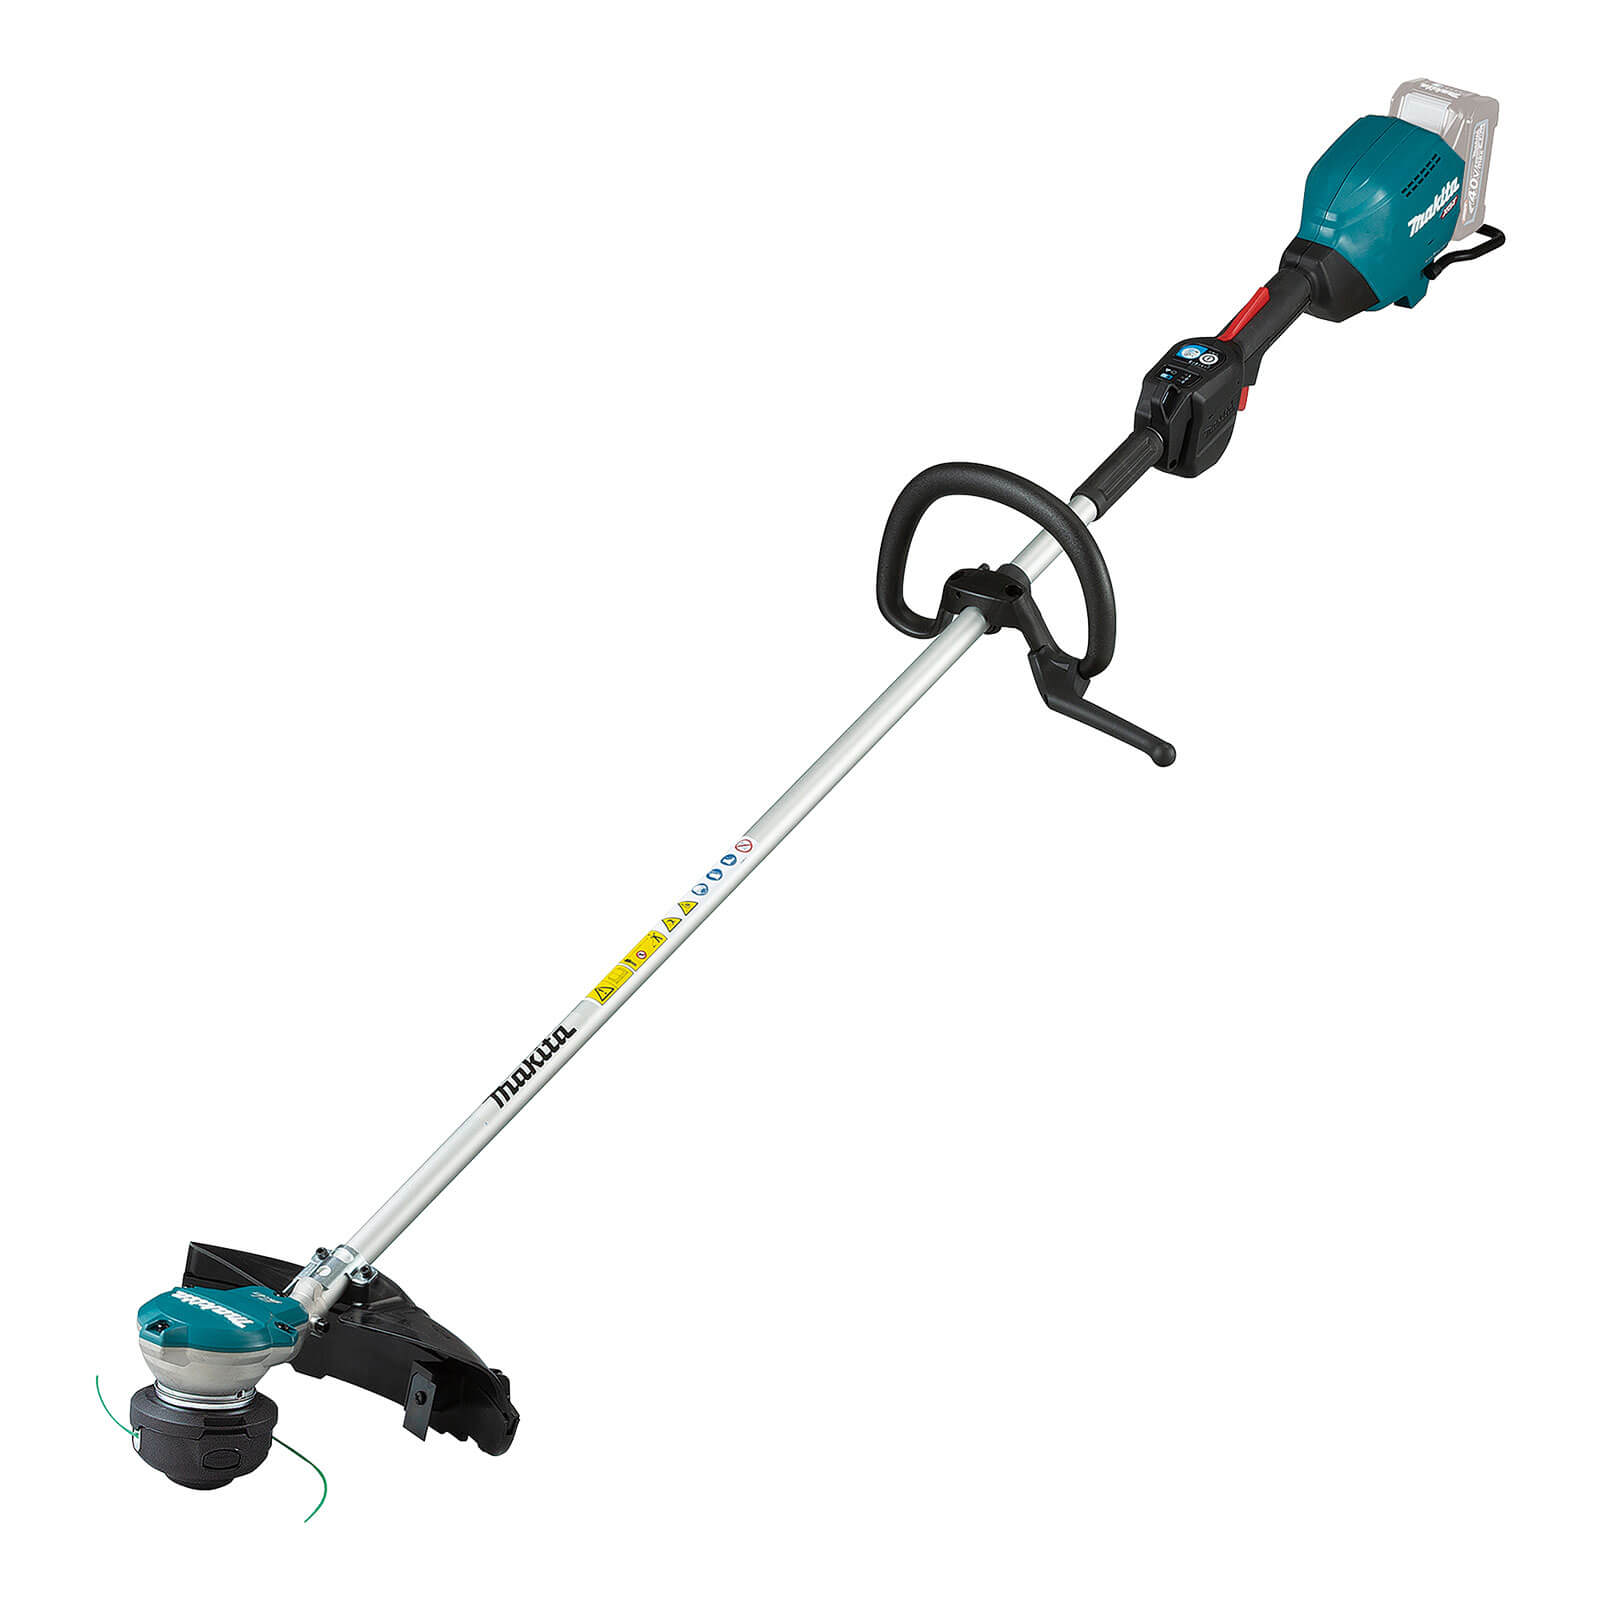 Makita UR003G 40v Max XGT Cordless Brushless Grass Trimmer 350mm No Batteries No Charger